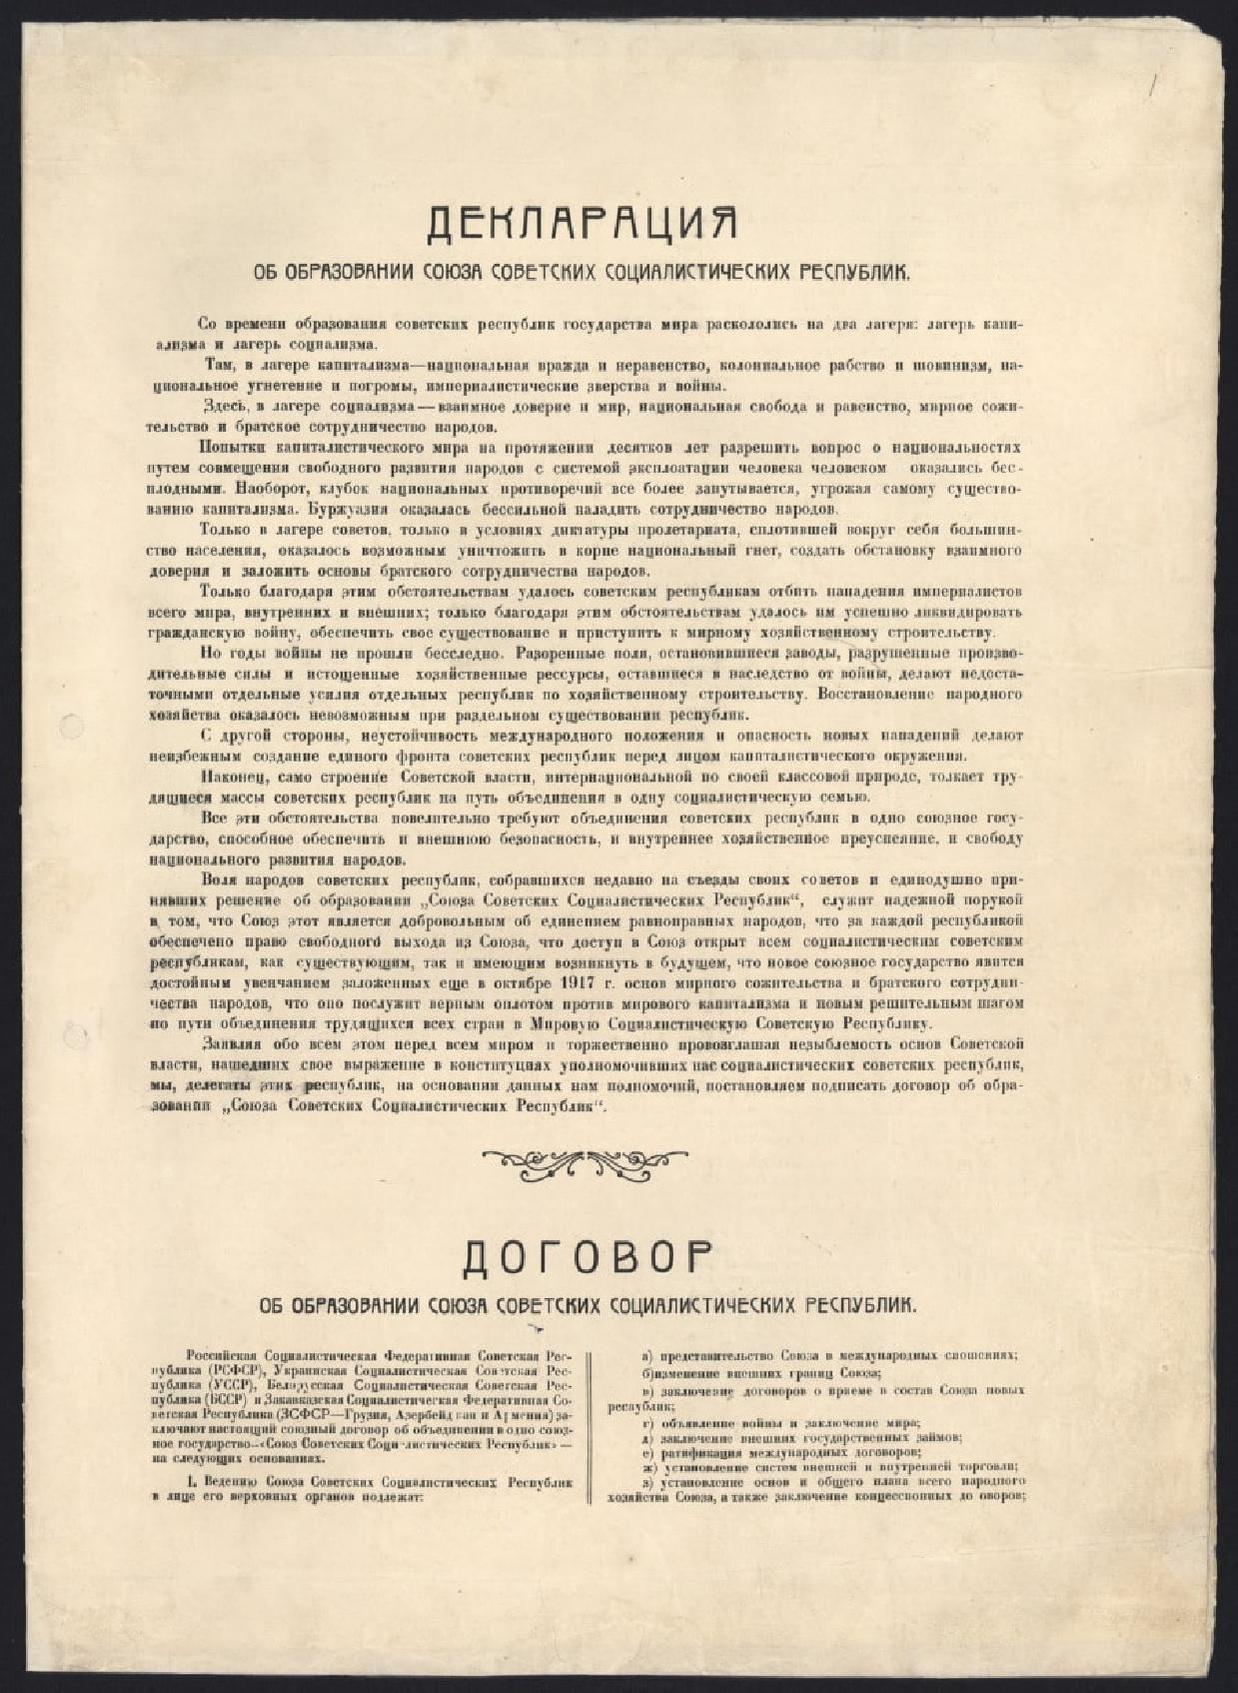 Декларация и договор об образовании СССР - Declaration and Treaty on the Creation of the USSR (page 1)